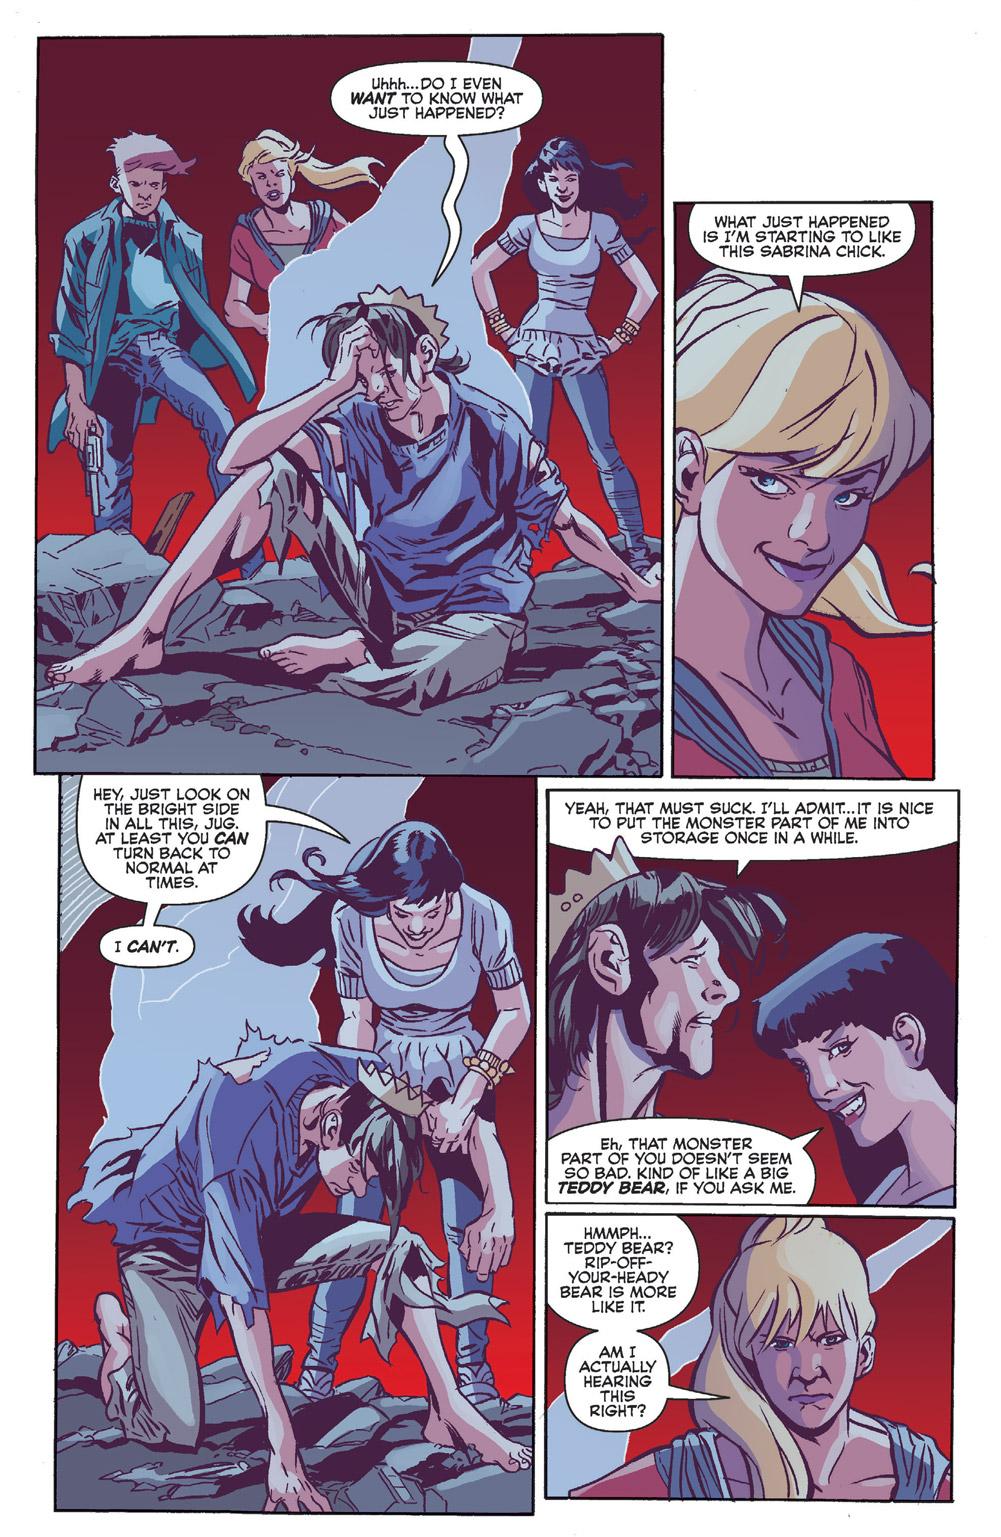 Some light flirting between Jughead and Veronica